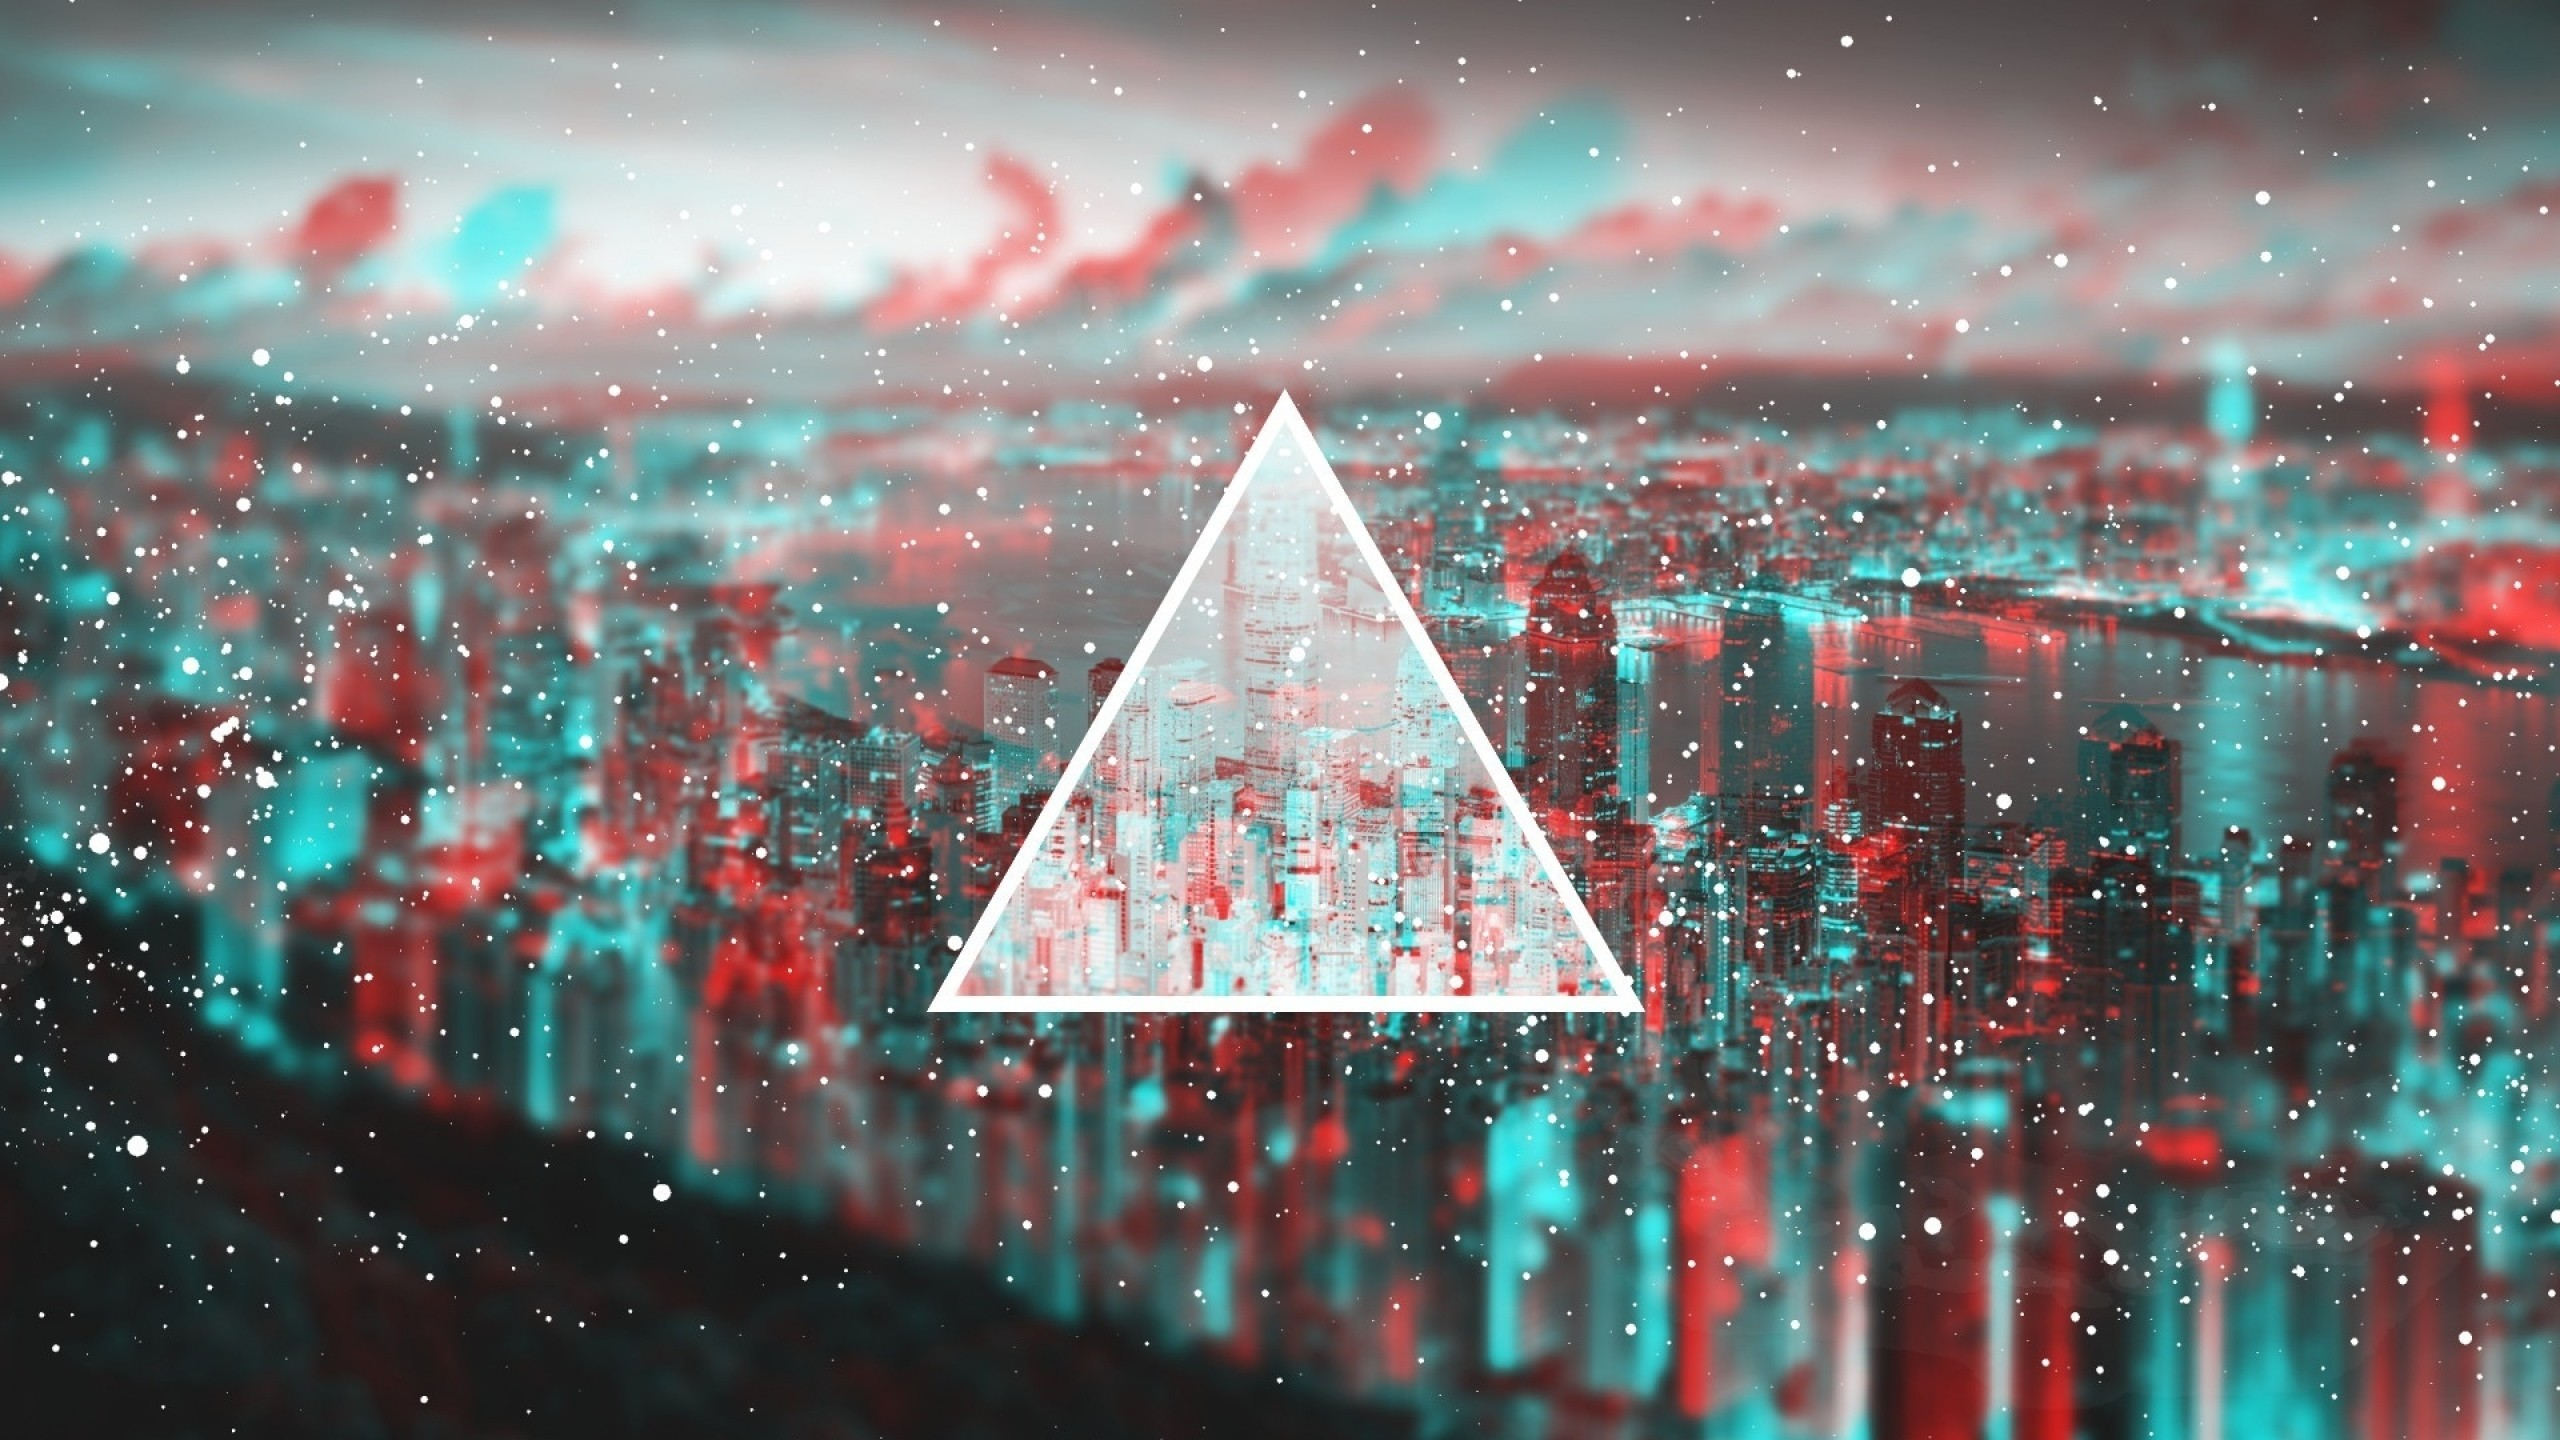 Wallpaper triangle, light, blurred